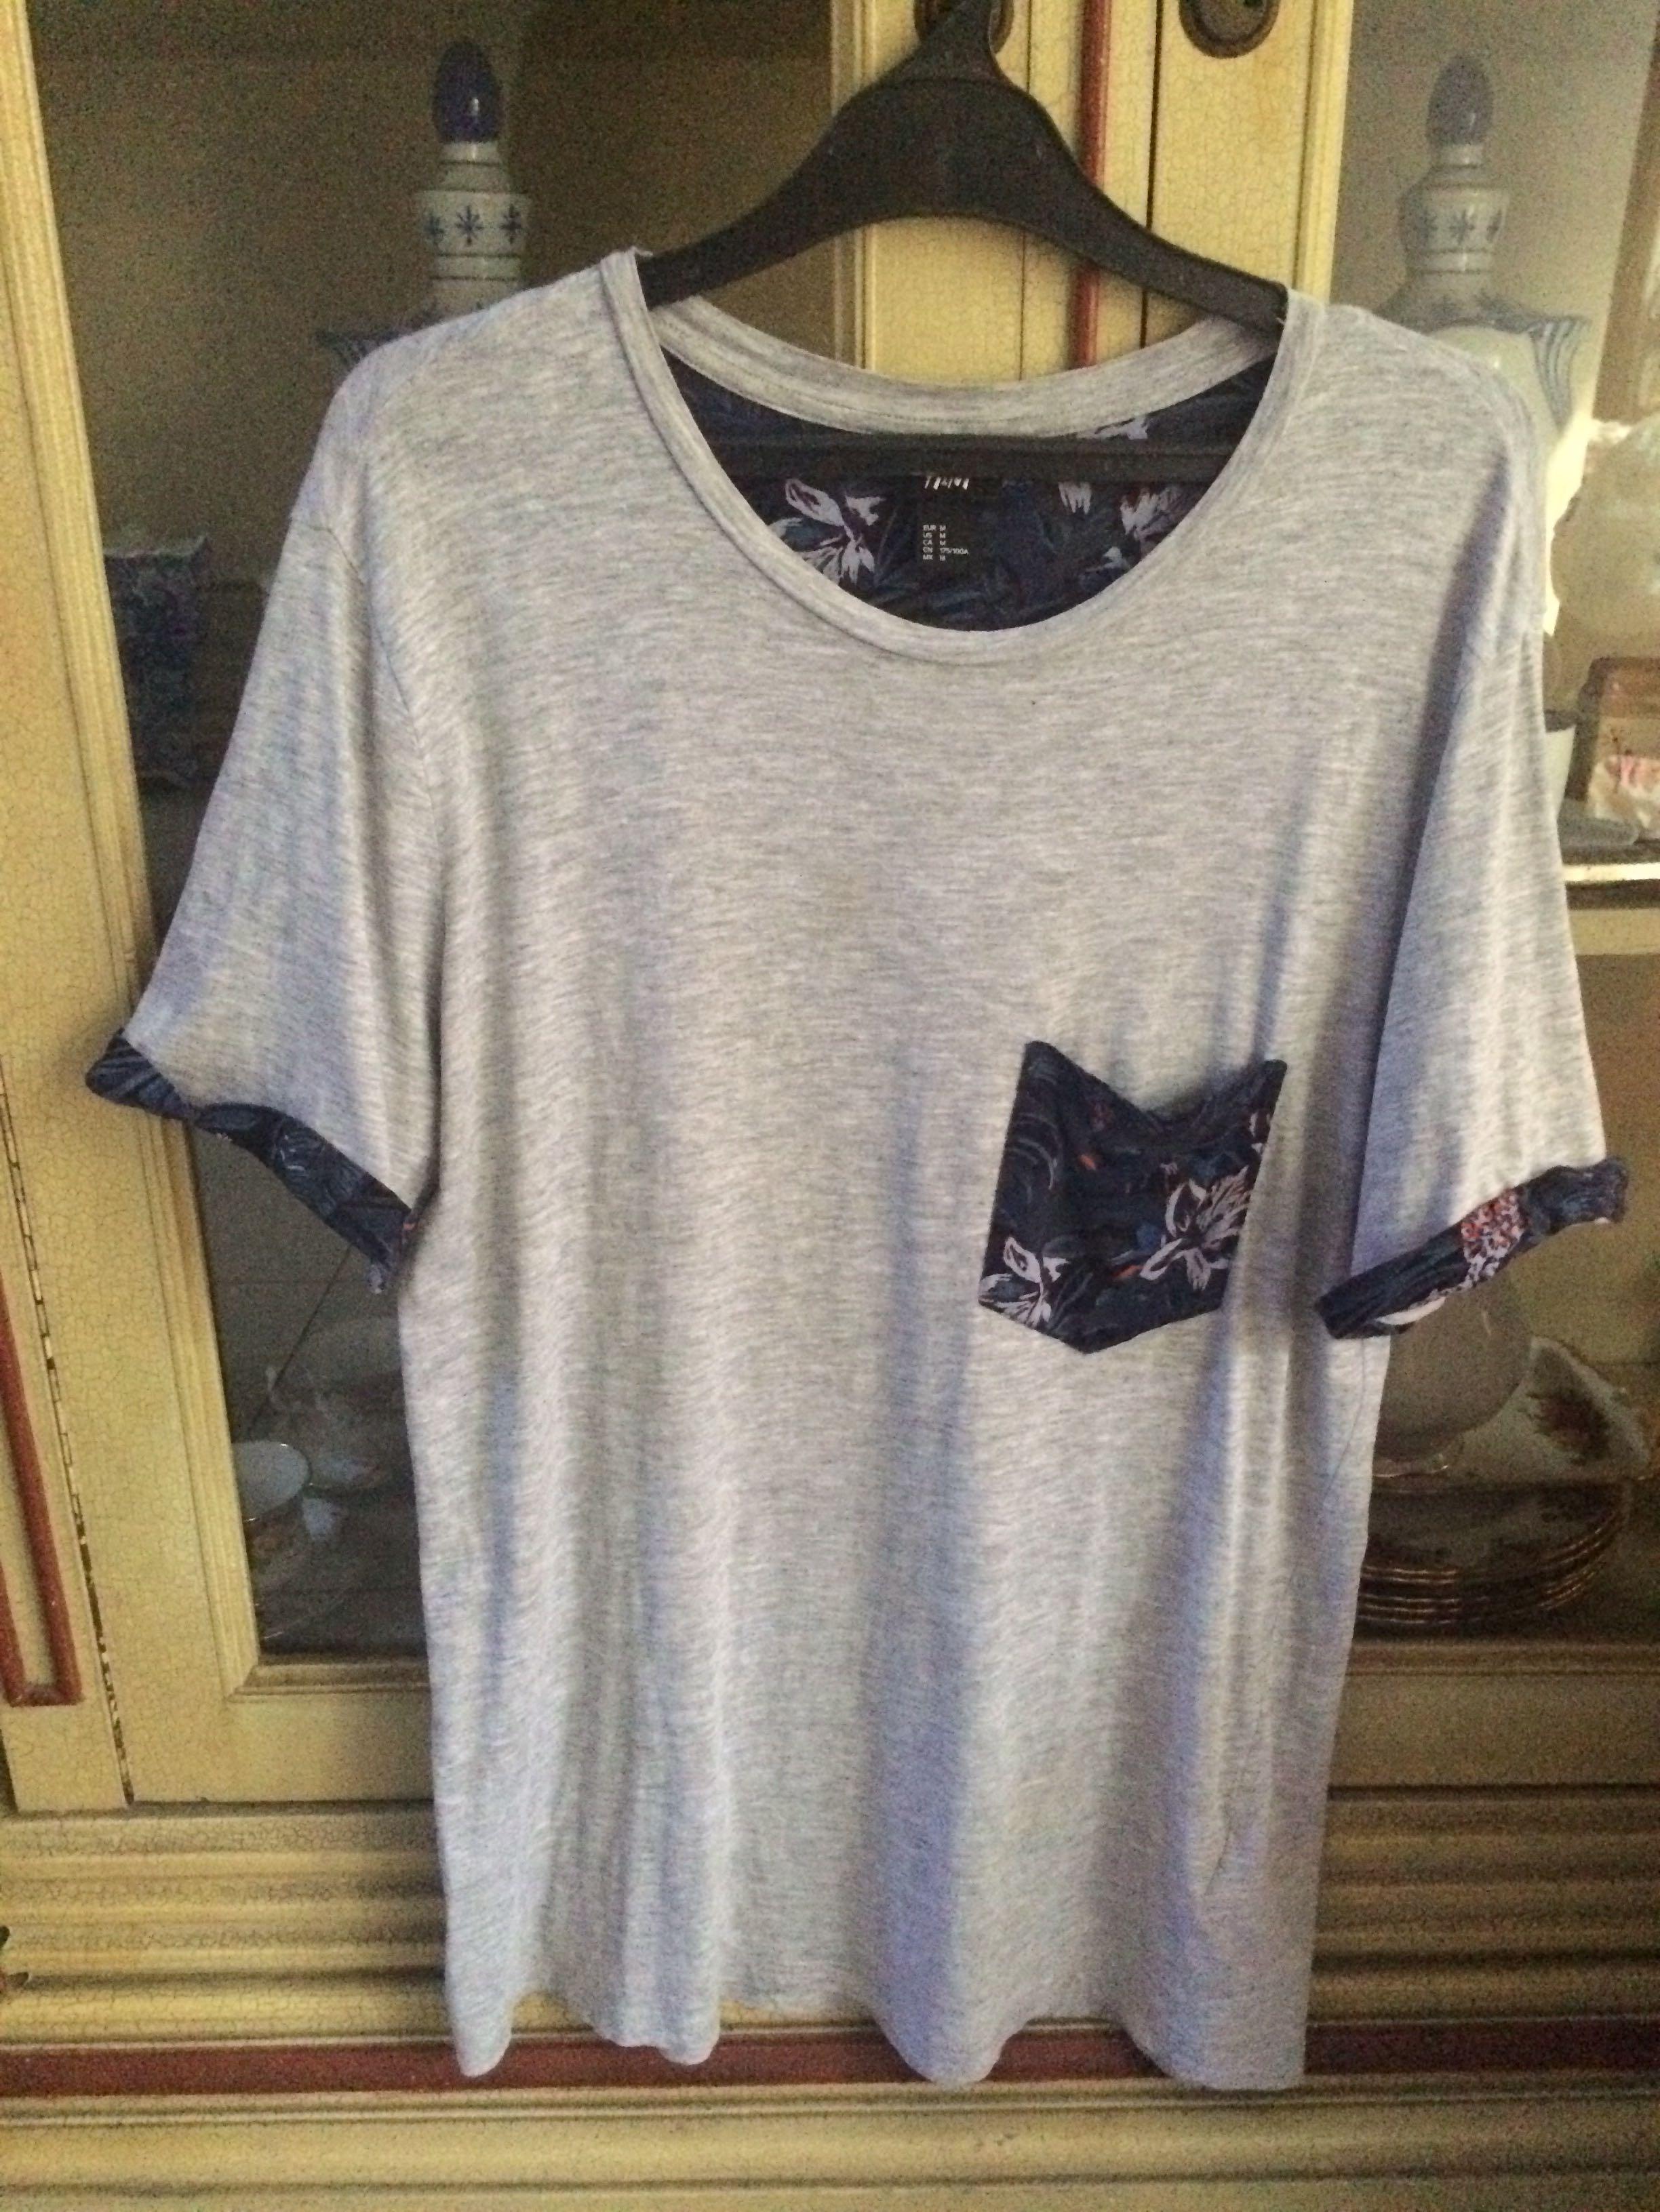 H&M Summer Tshirt